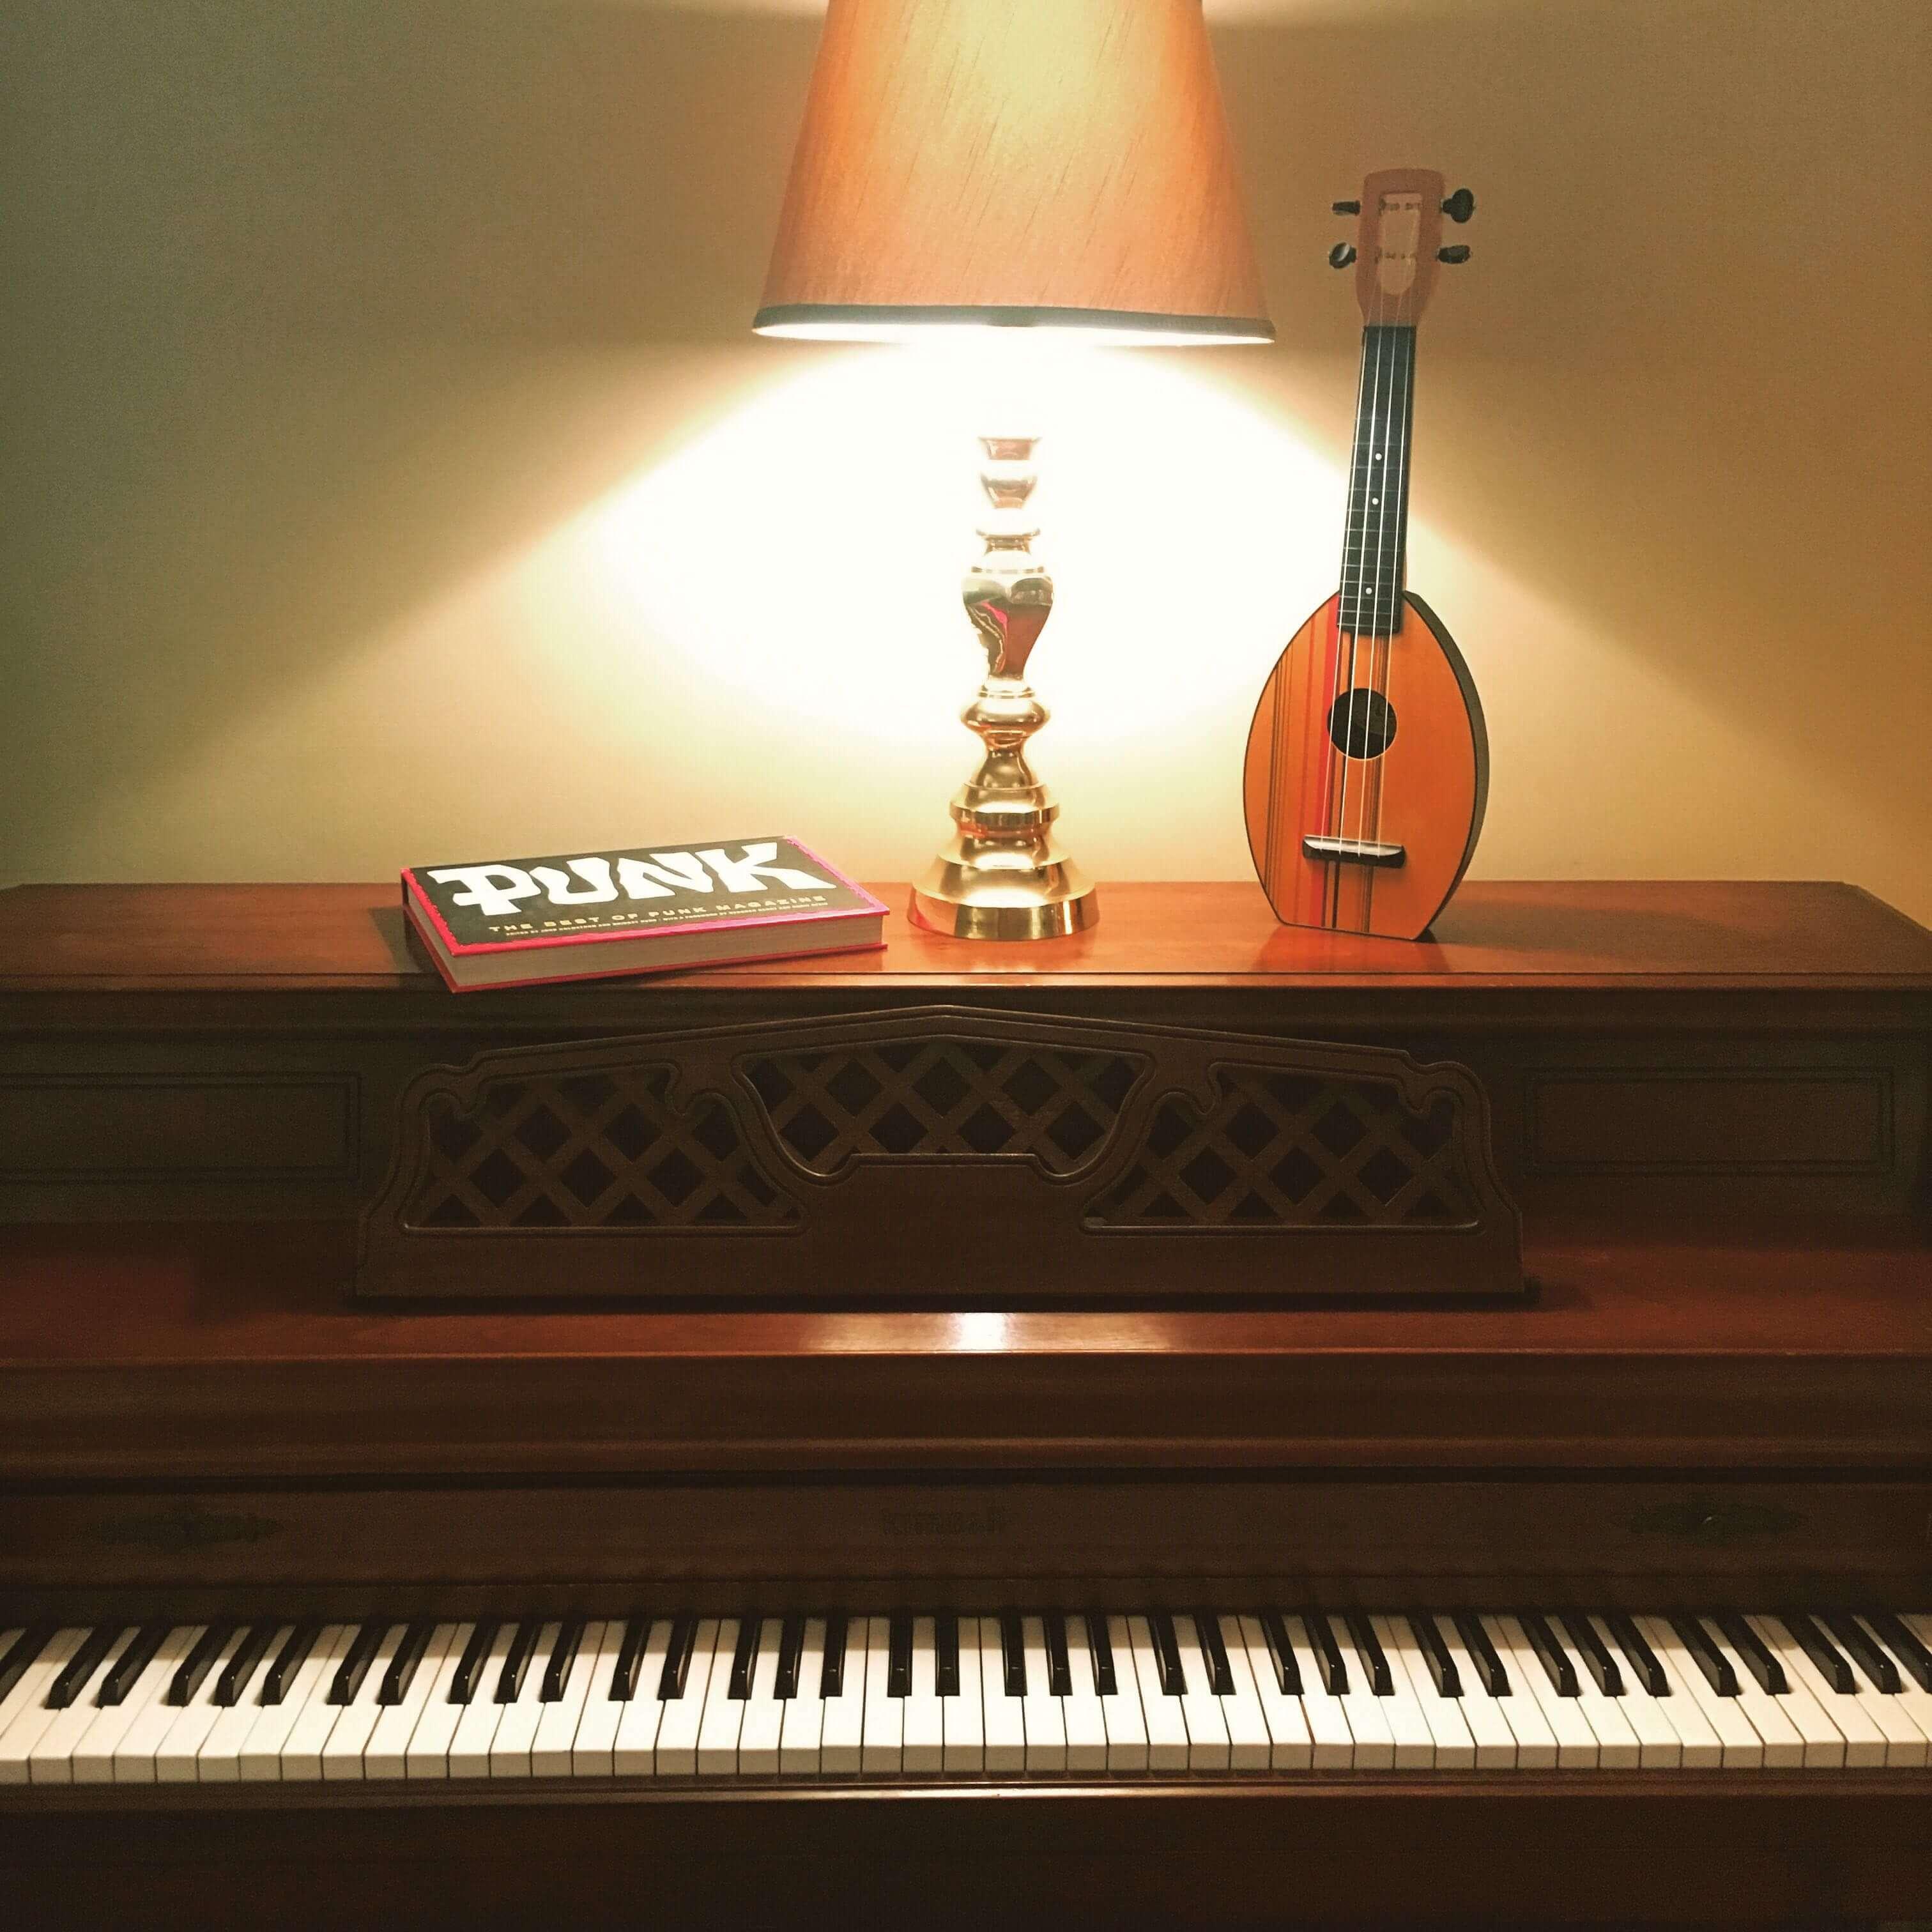 Kimball upright piano with uke in a rehearsal pod